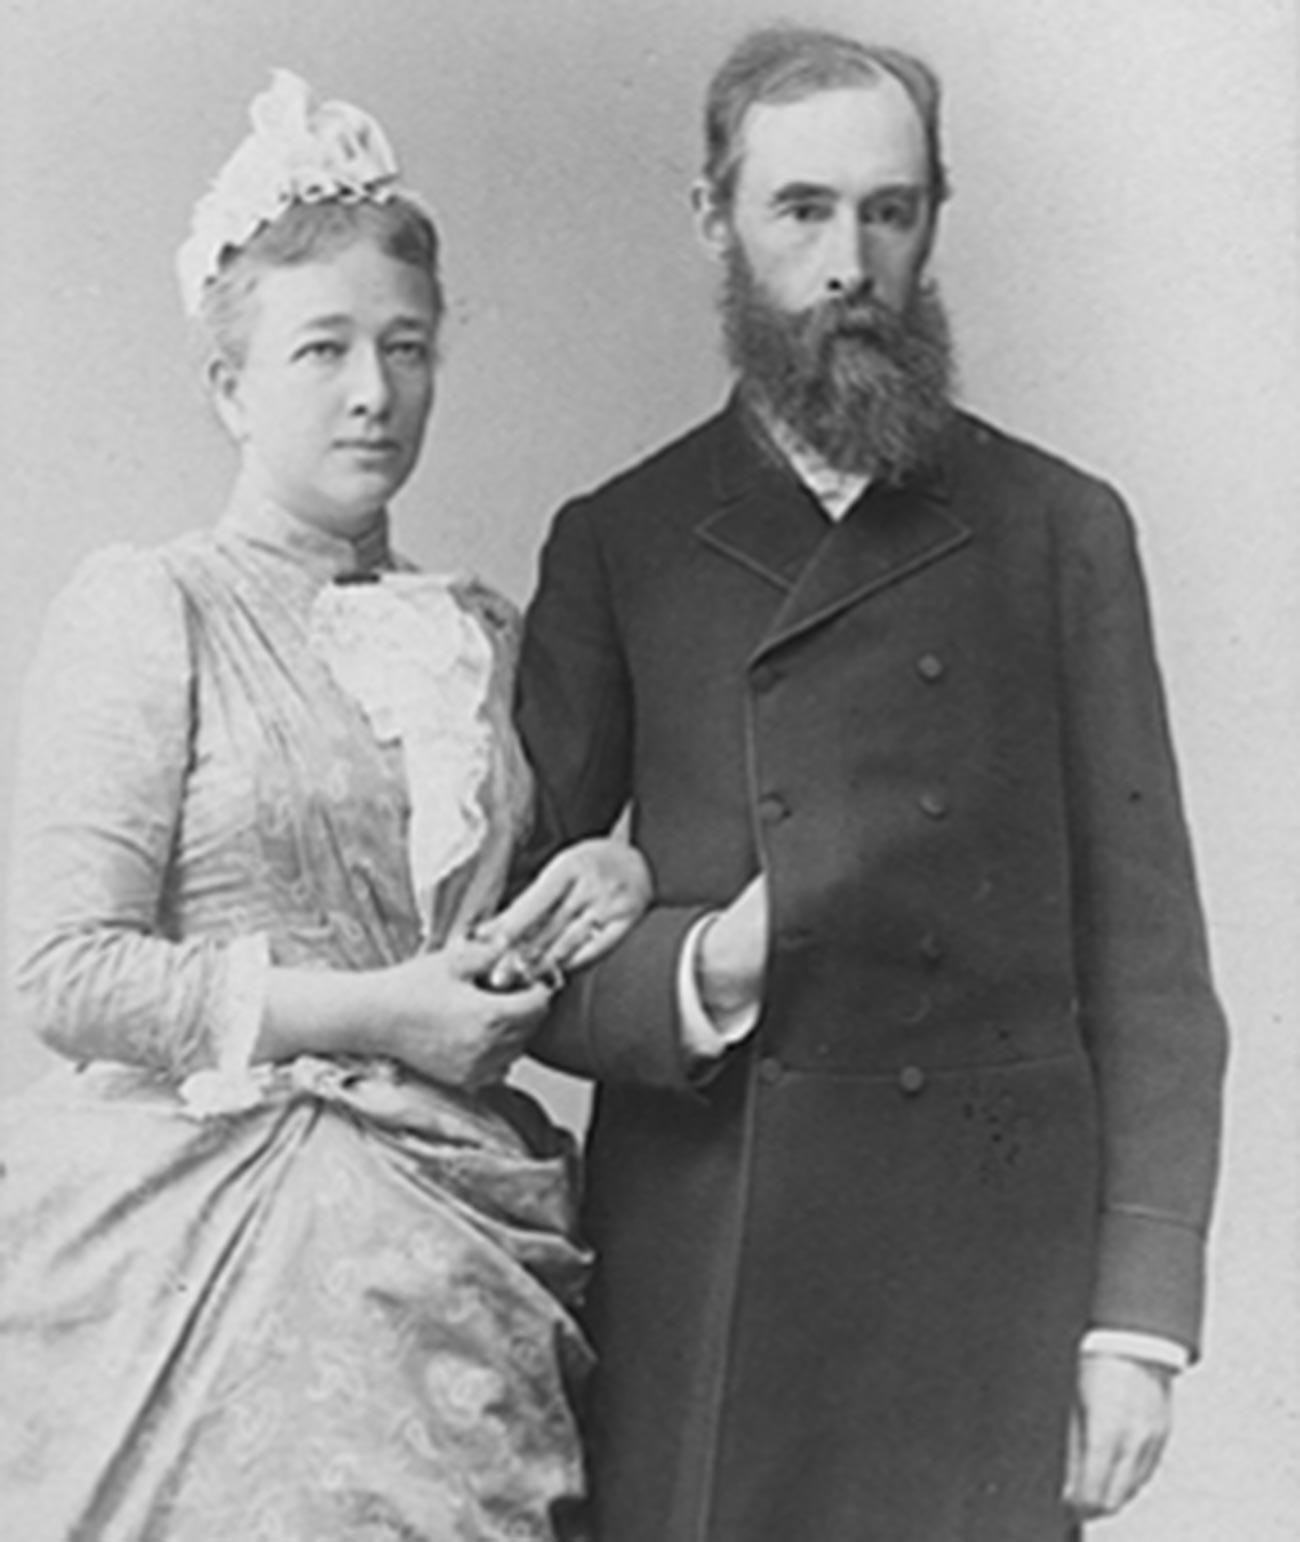 Pavel Tretyakov en zijn vrouw, Vera Mamontova